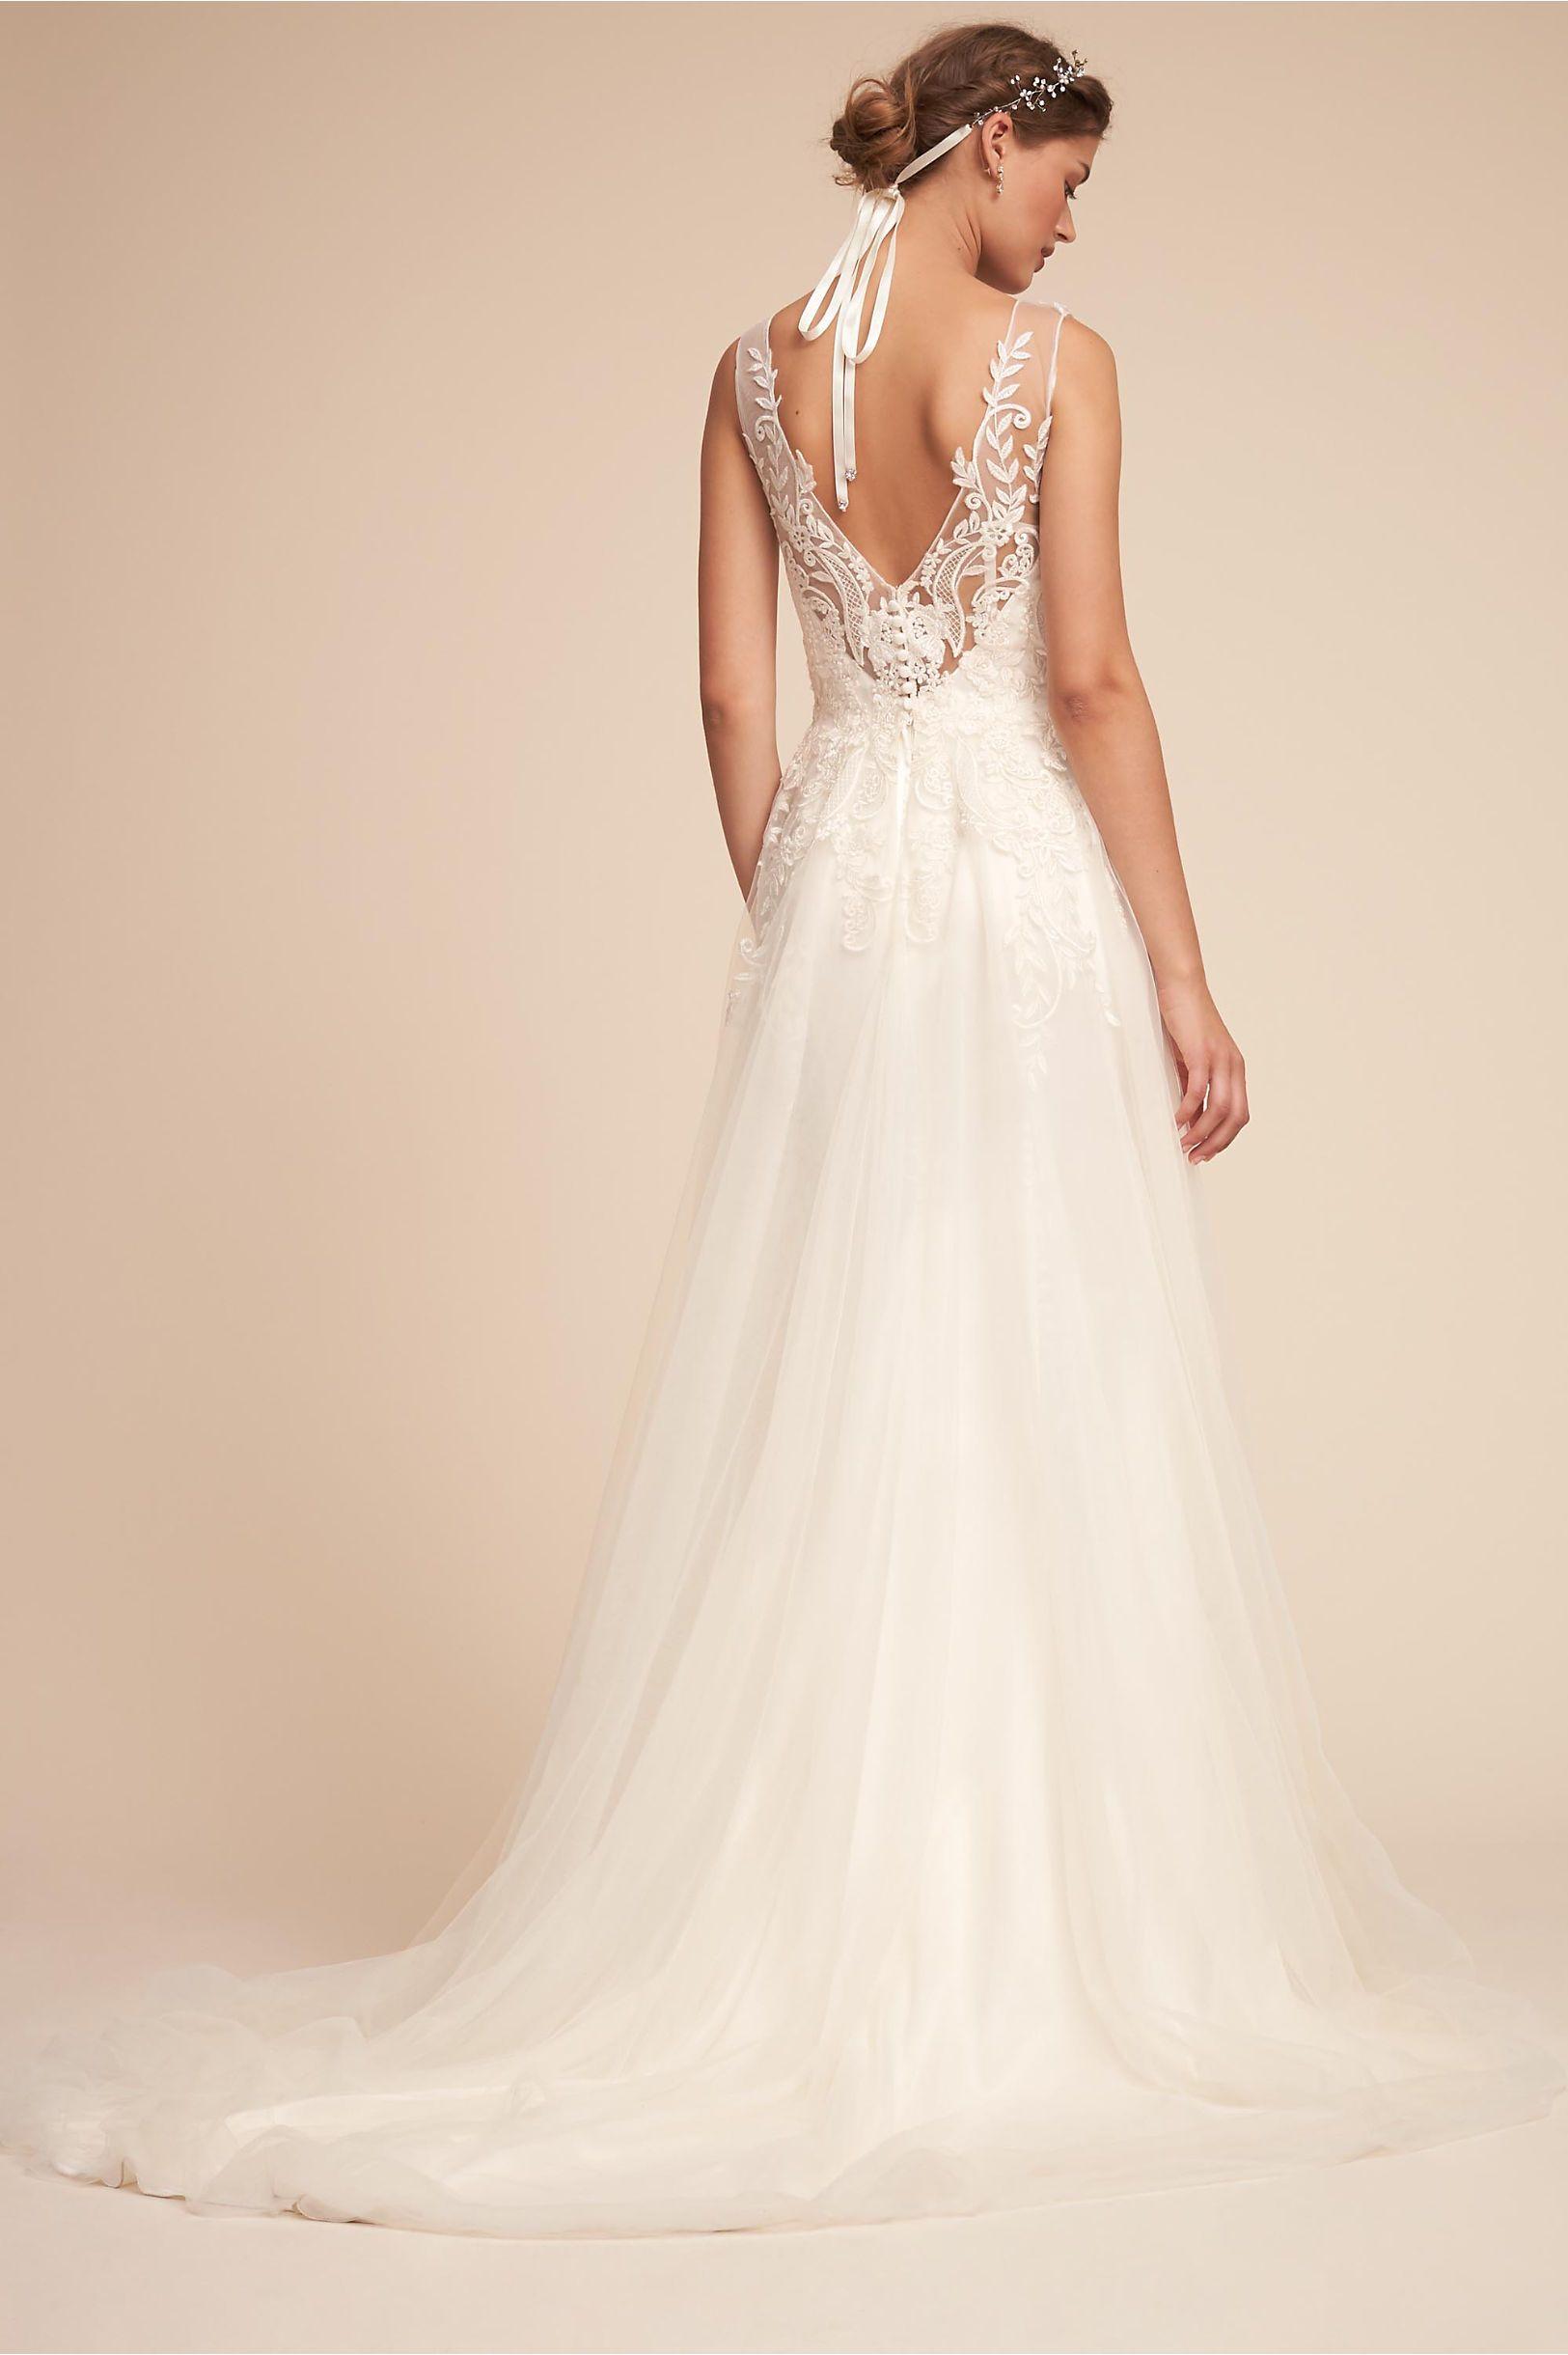 BHLDN Madrick Gown Ivory in Bride   BHLDN   Bhldn   Pinterest ...